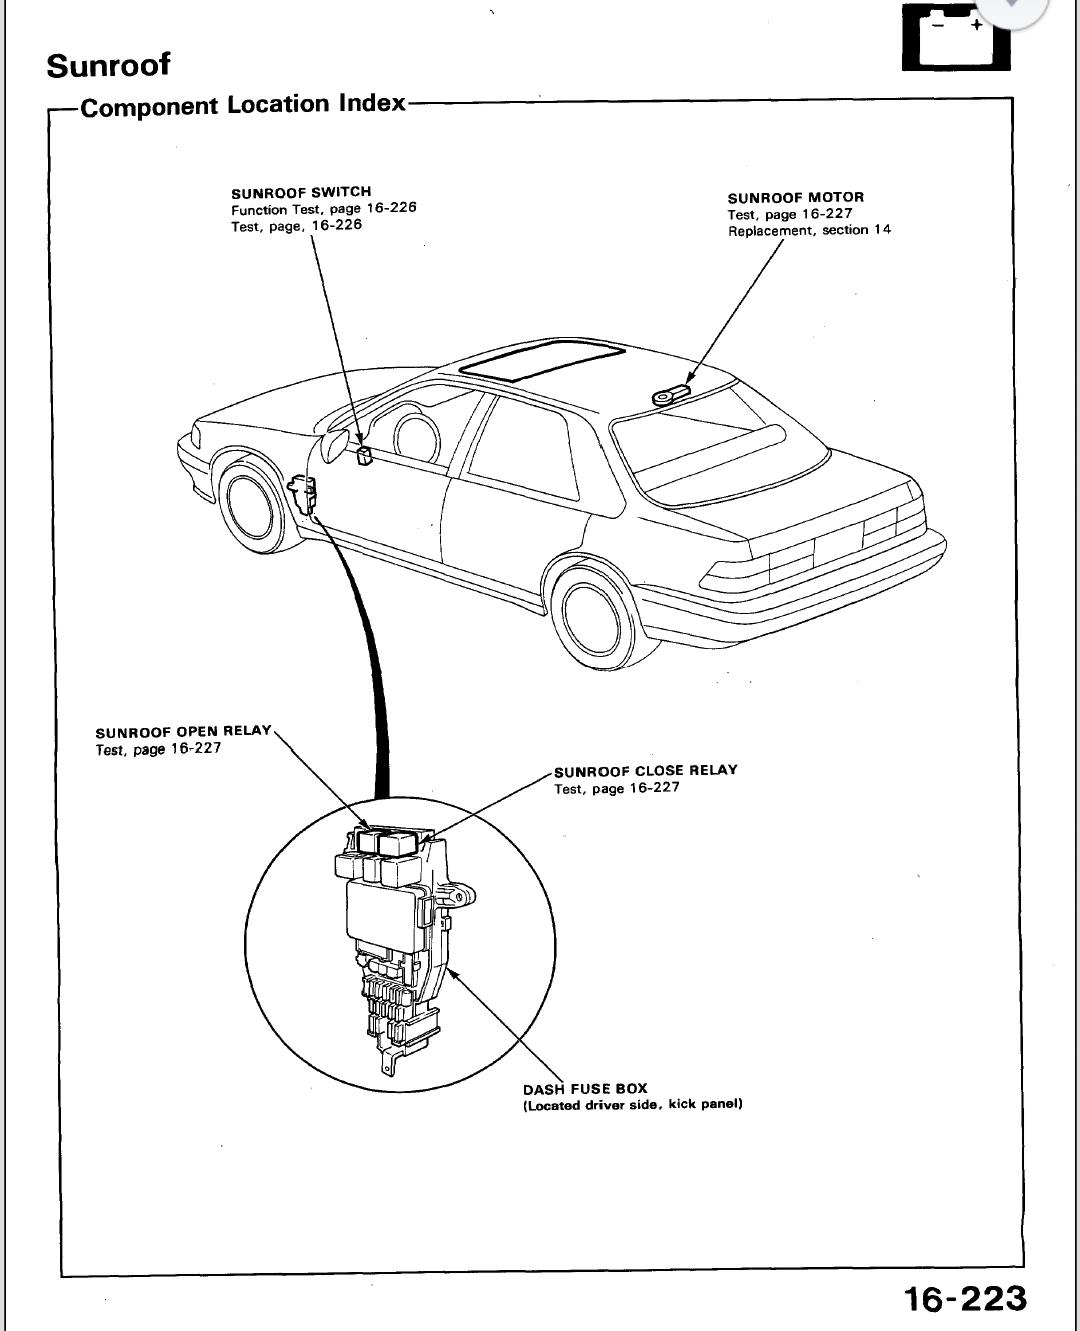 1993 Honda Civic Wiring Diagram Besides 98 Honda Civic Fuse Box